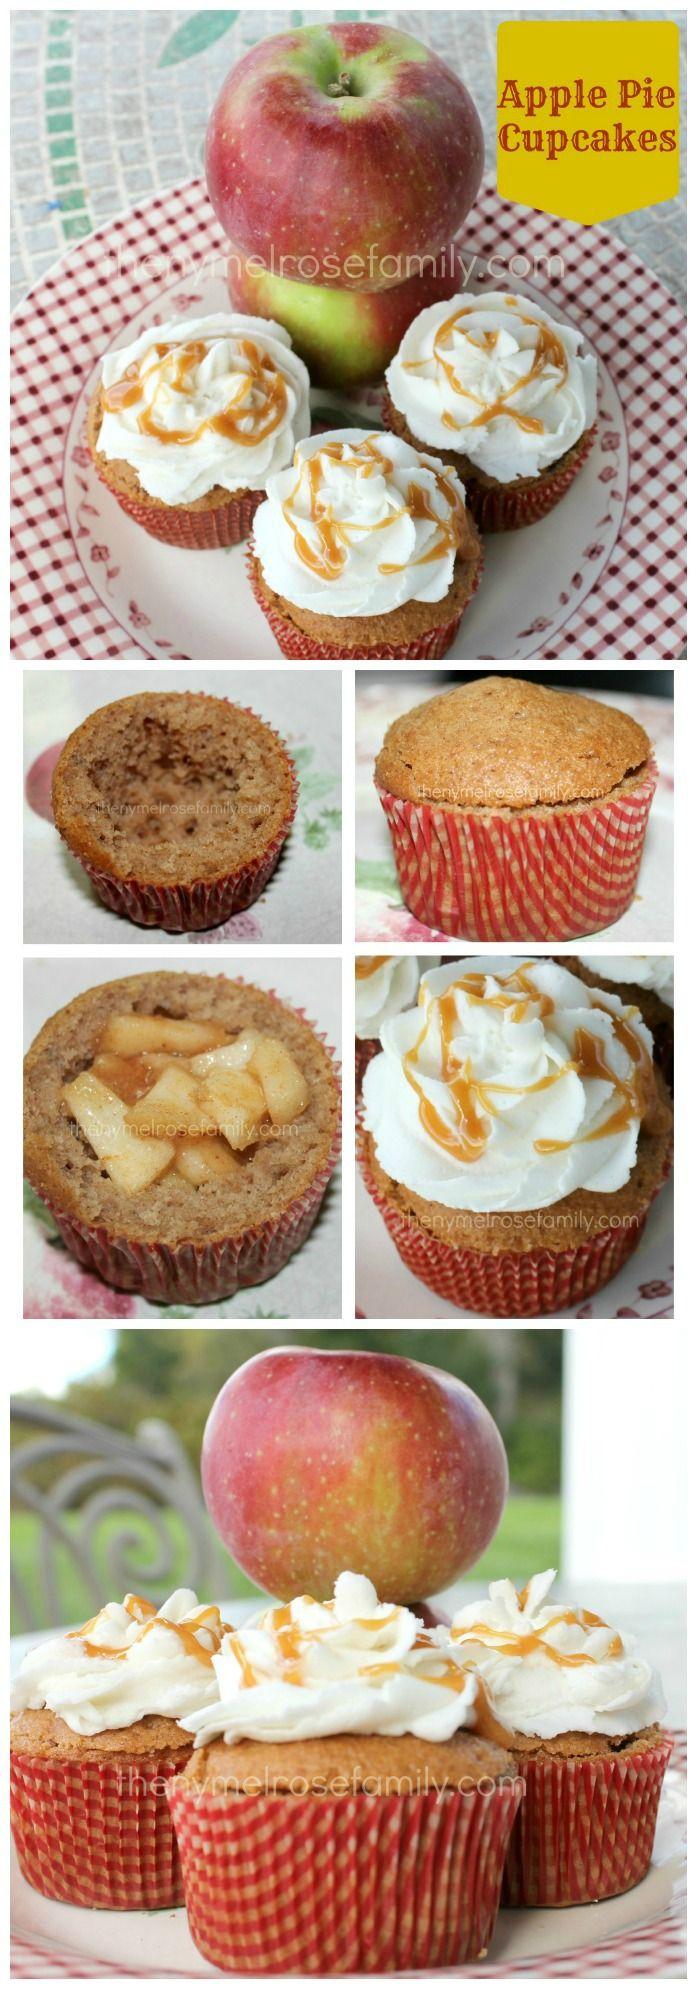 Apple Pie Cupcakes www.thenymelrosefamily.com #applepie #cupcakes